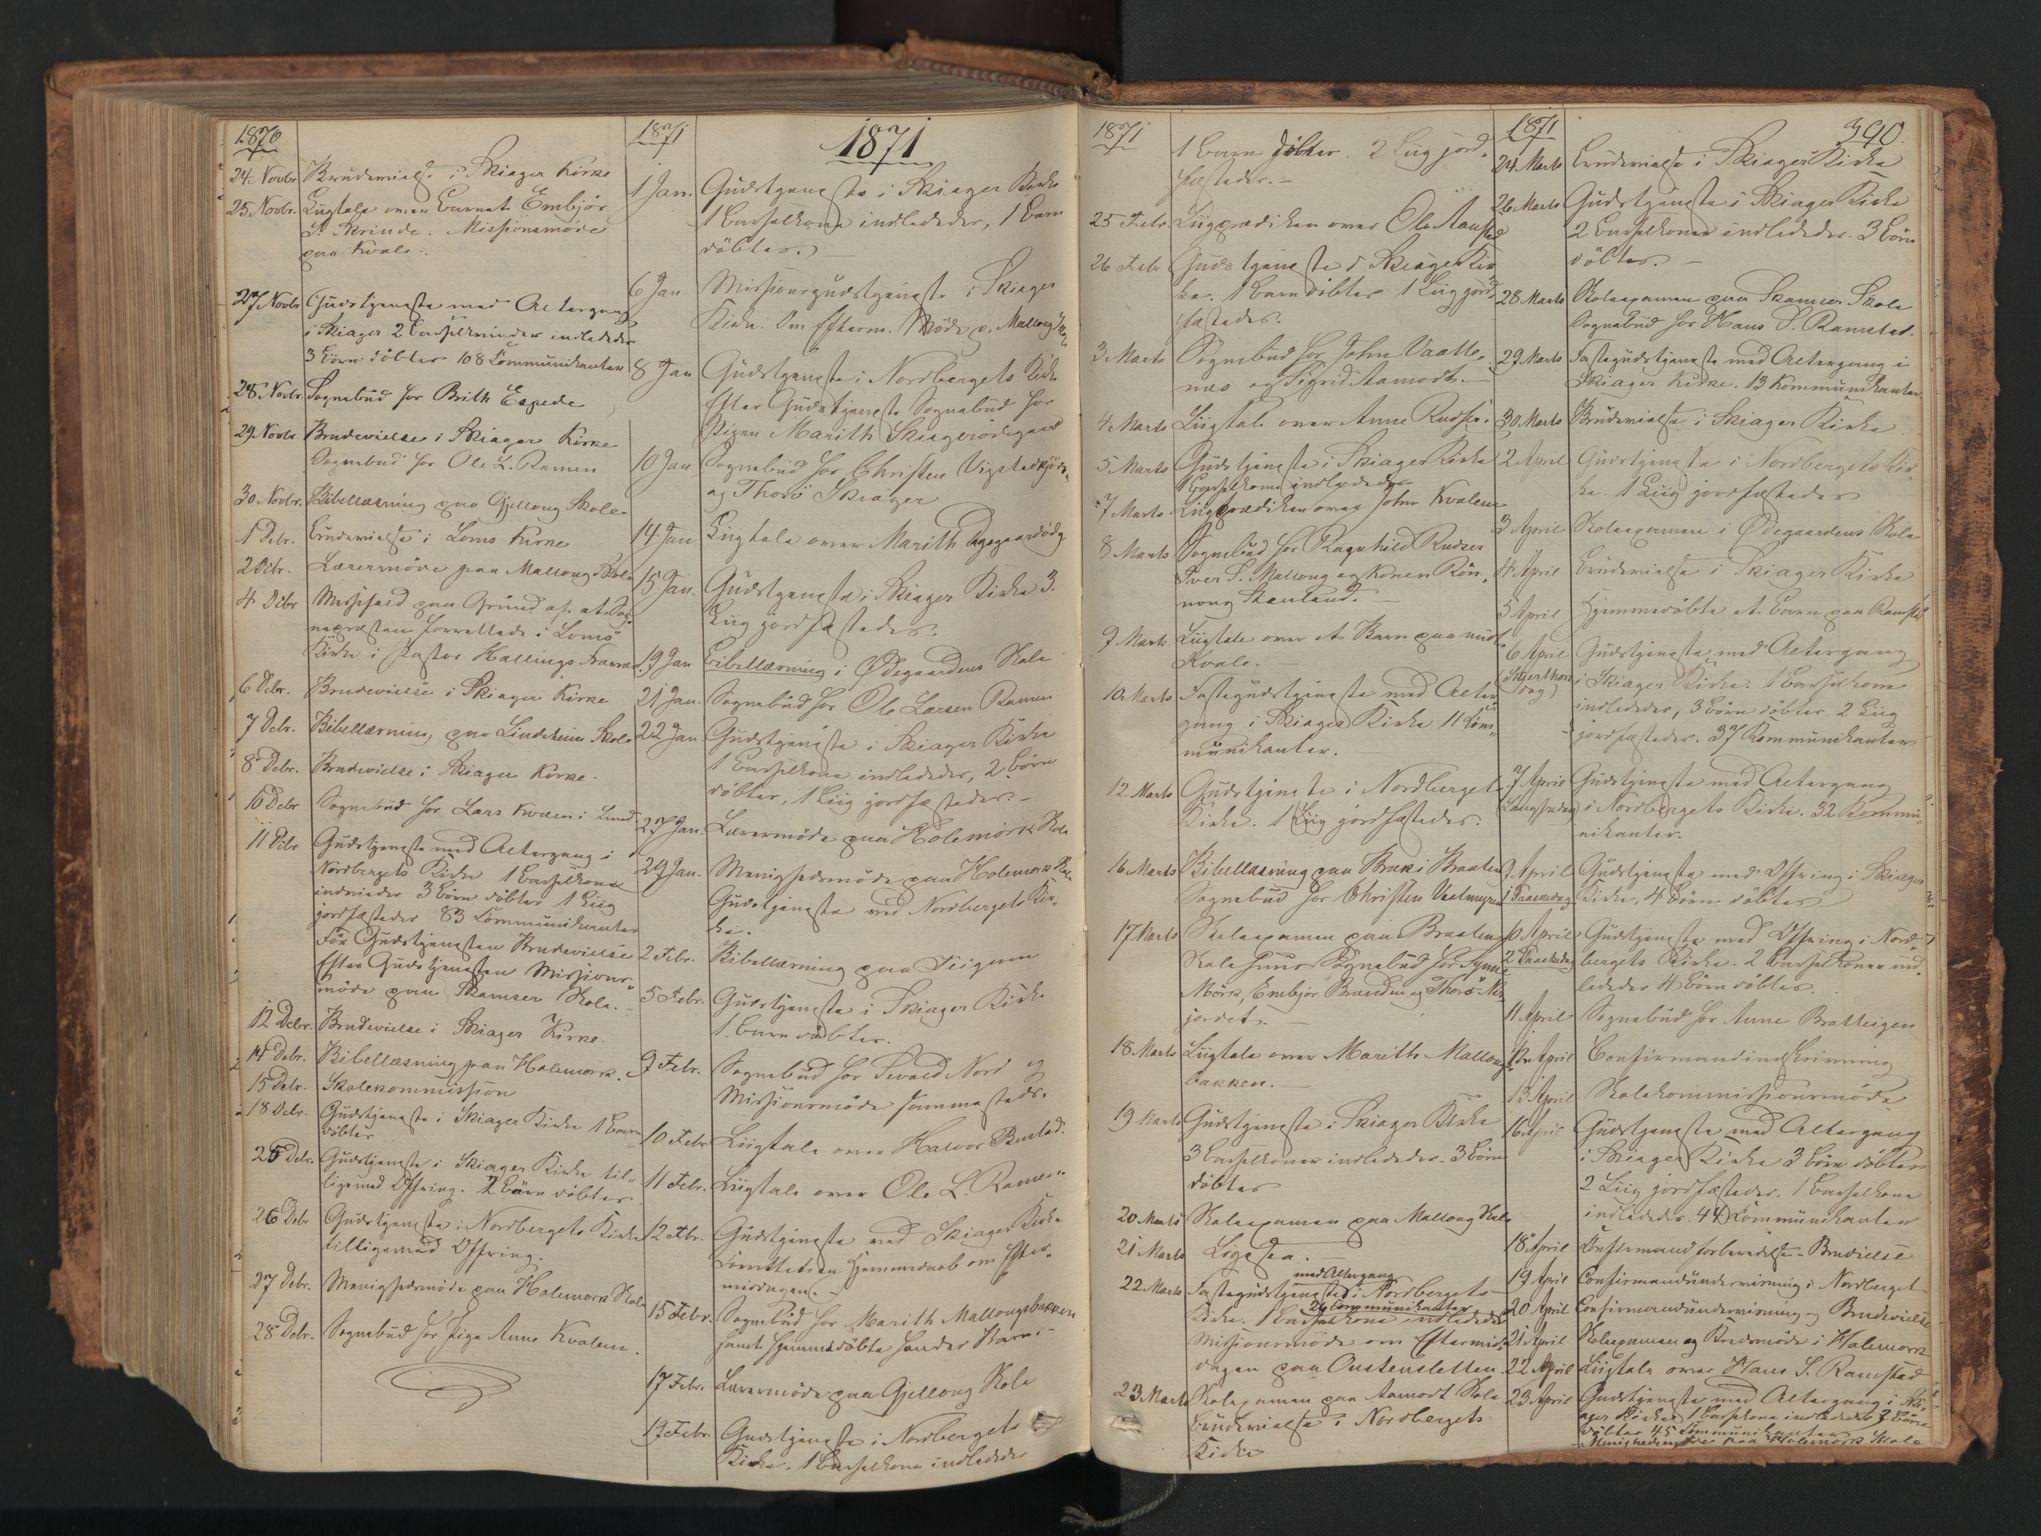 SAH, Skjåk prestekontor, Ministerialbok nr. 1, 1863-1879, s. 390